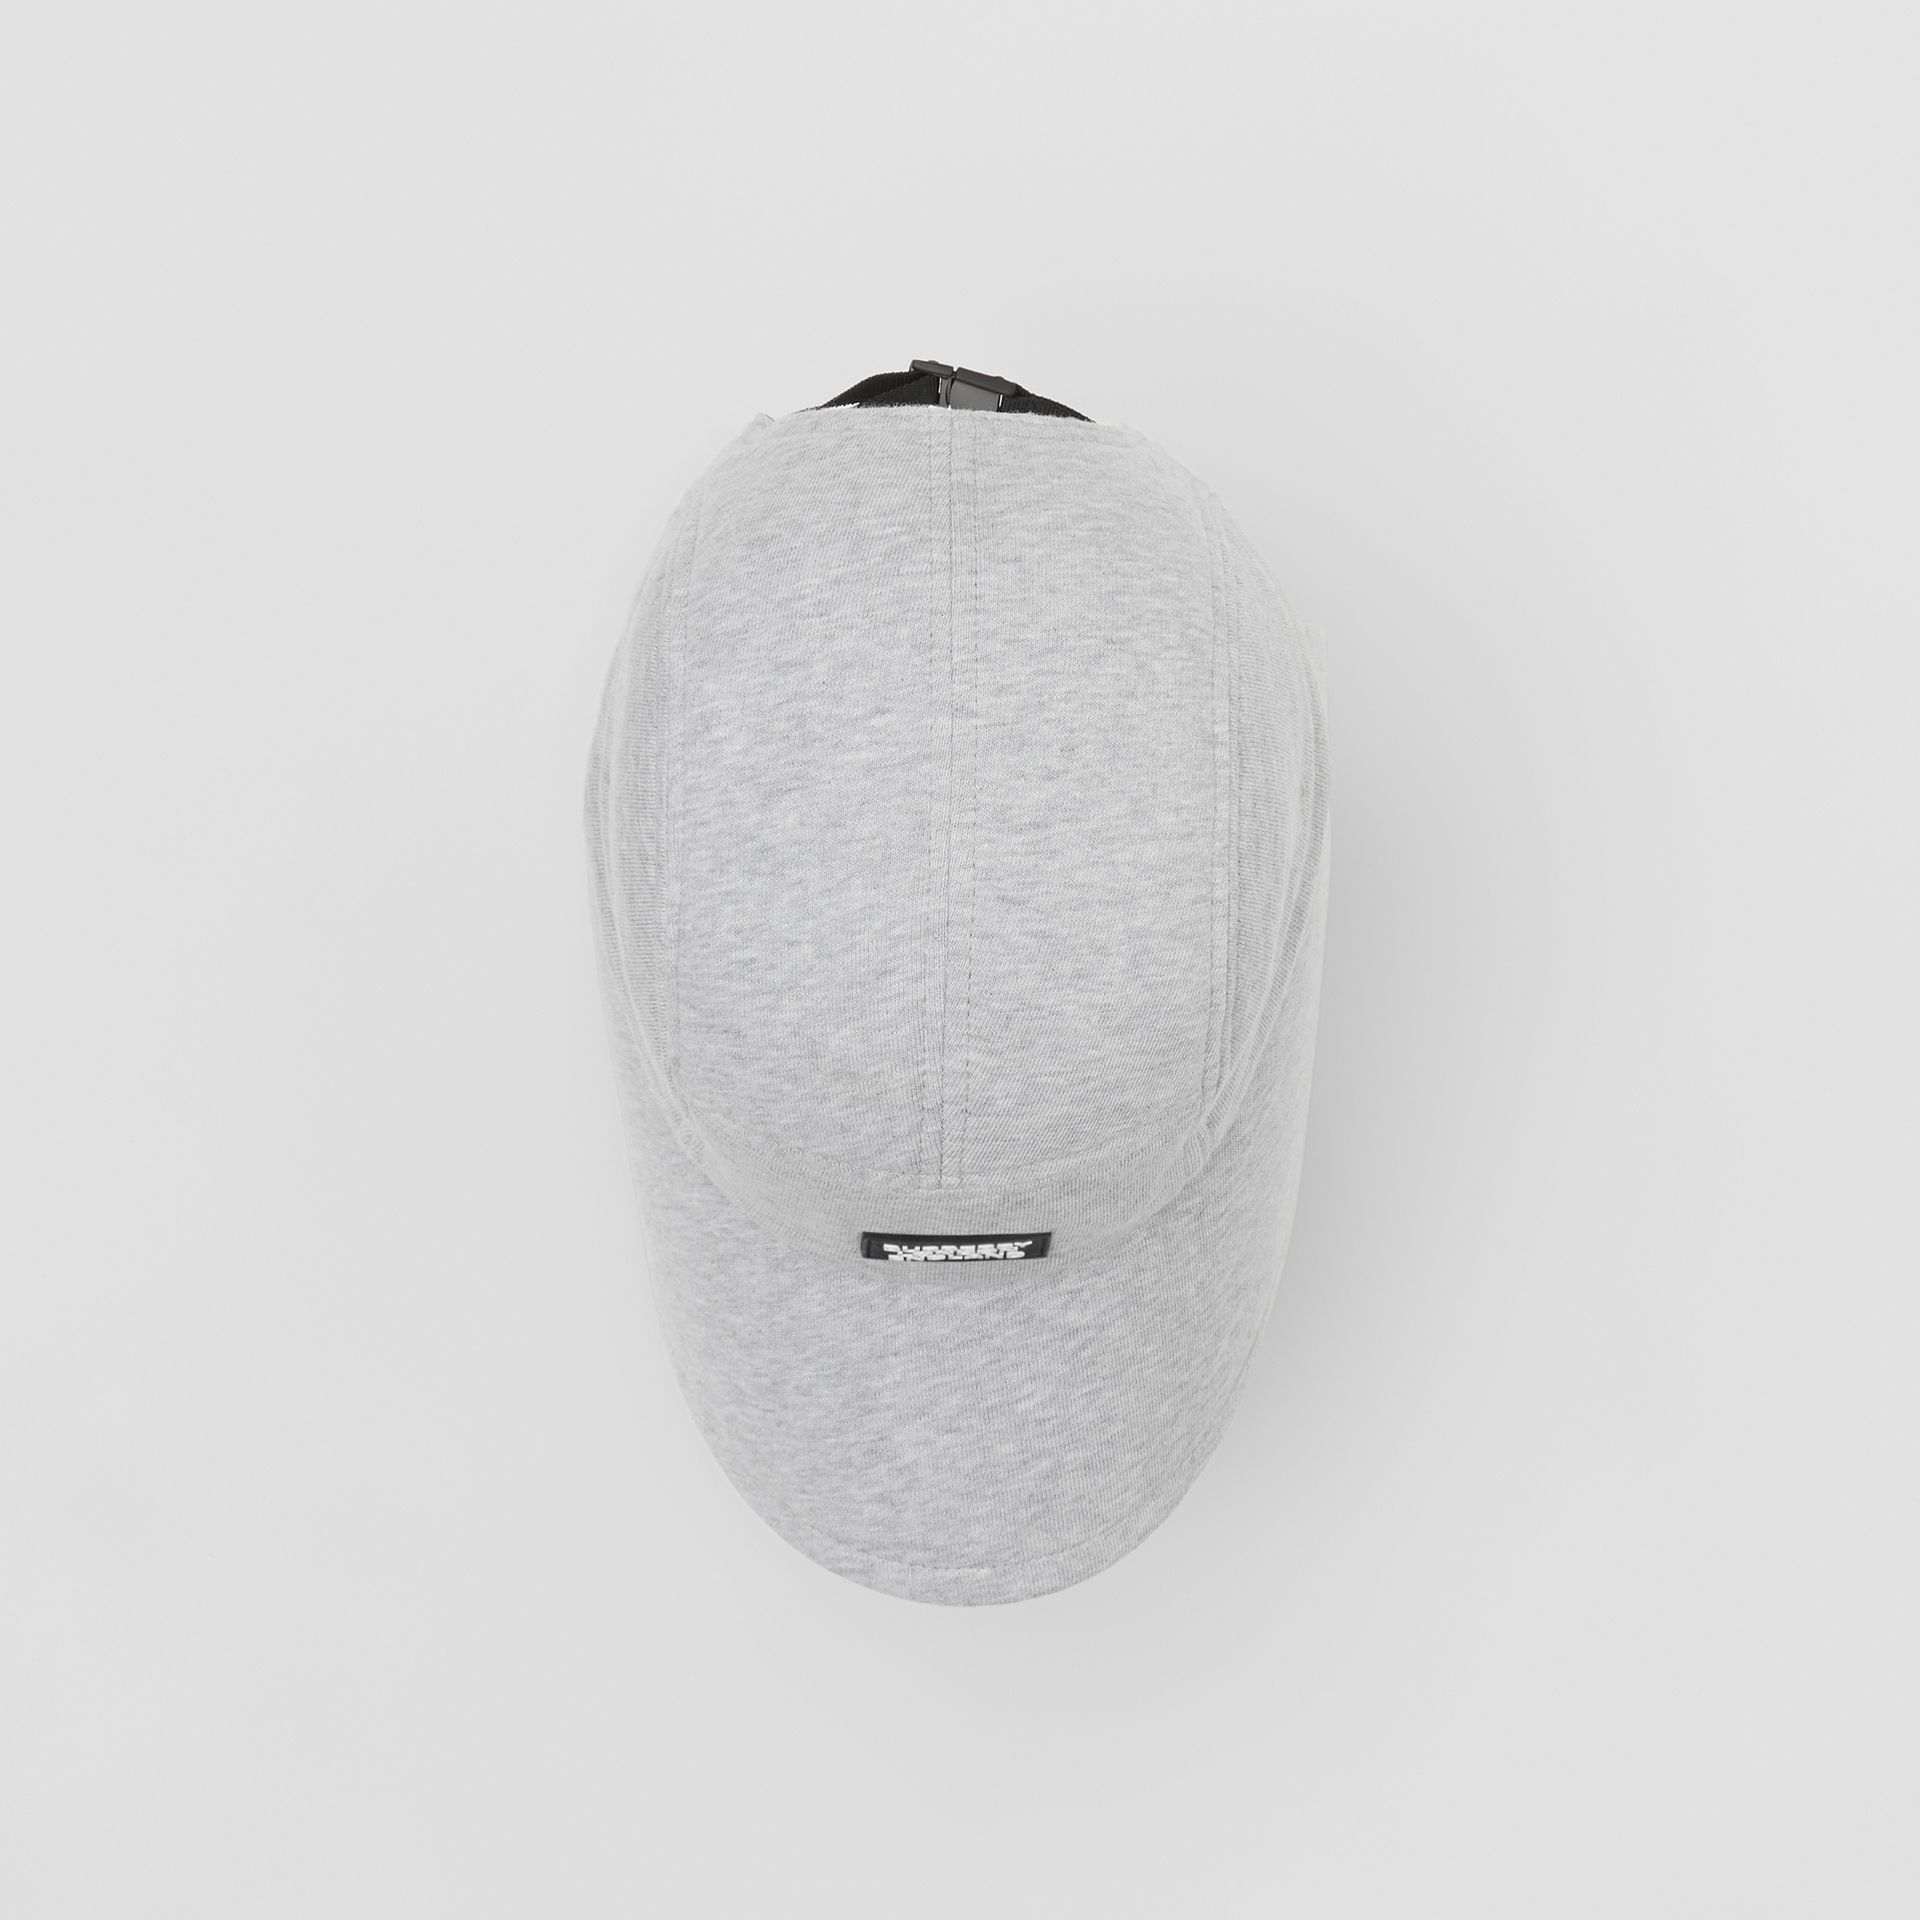 Logo Appliqué Cotton Jersey Bonnet Cap in Light Pebble Grey | Burberry - gallery image 3